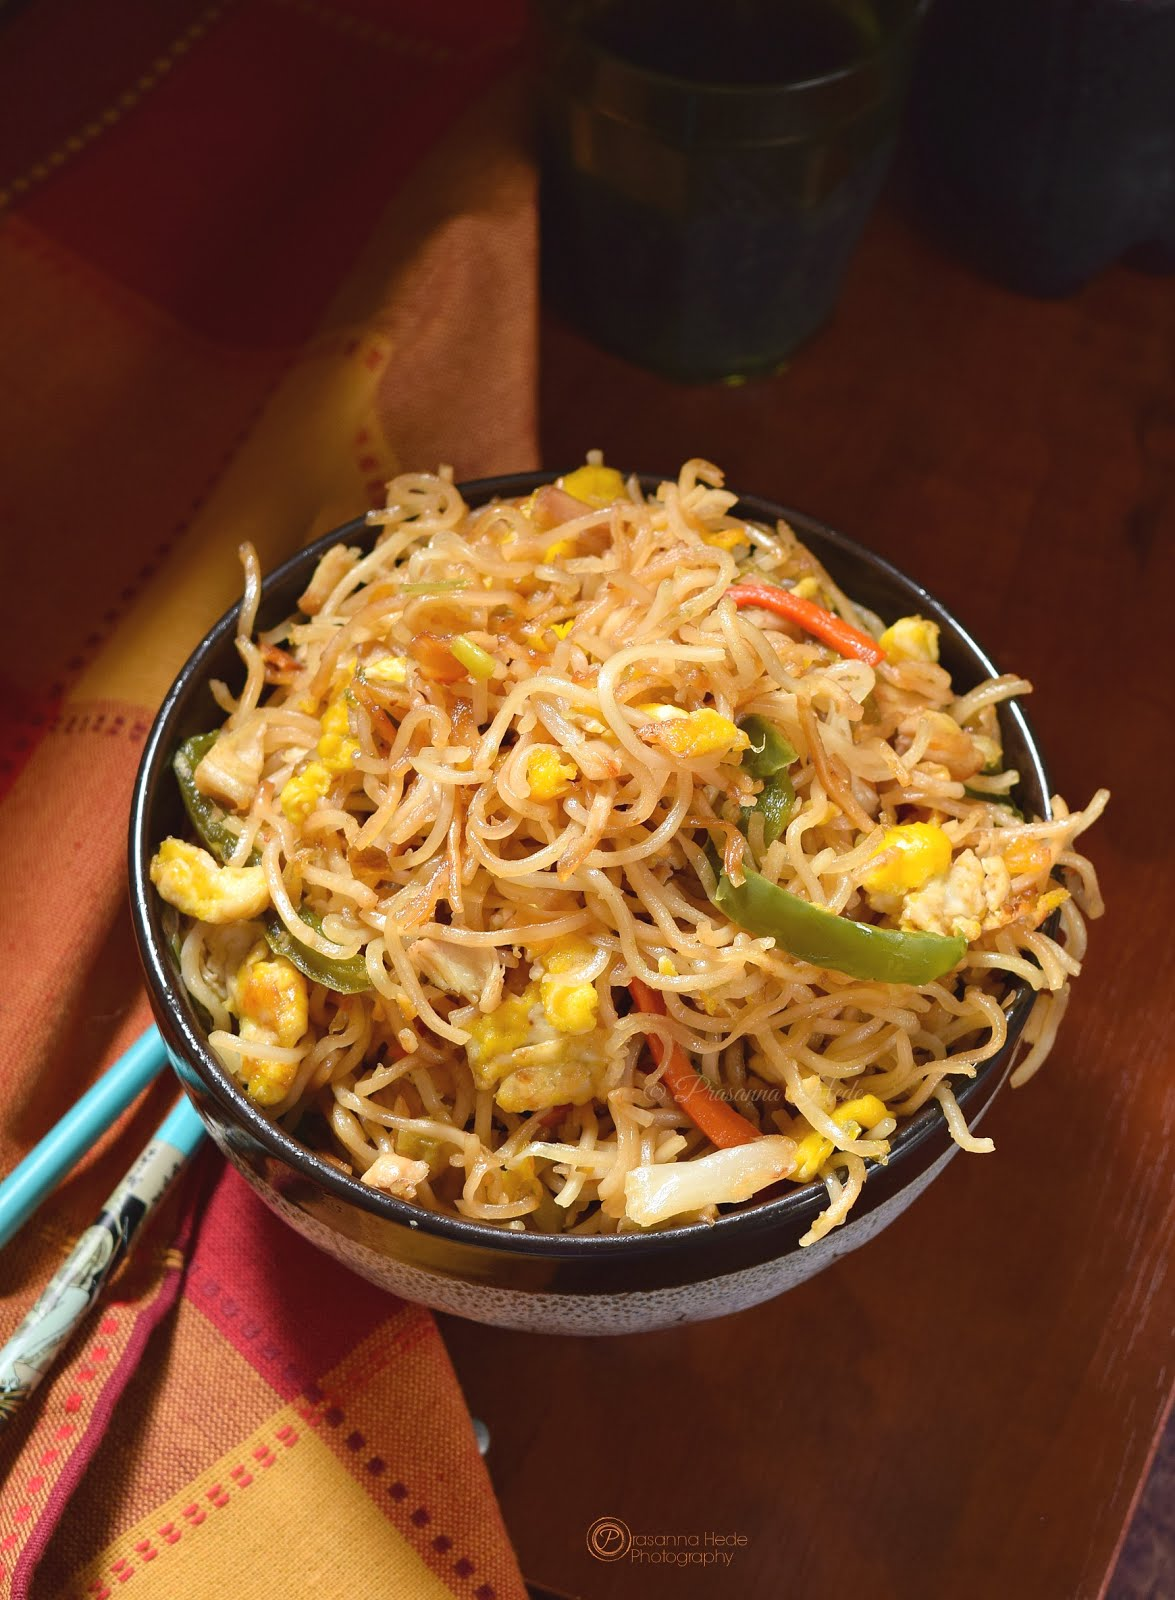 Crispy pan fried noodles